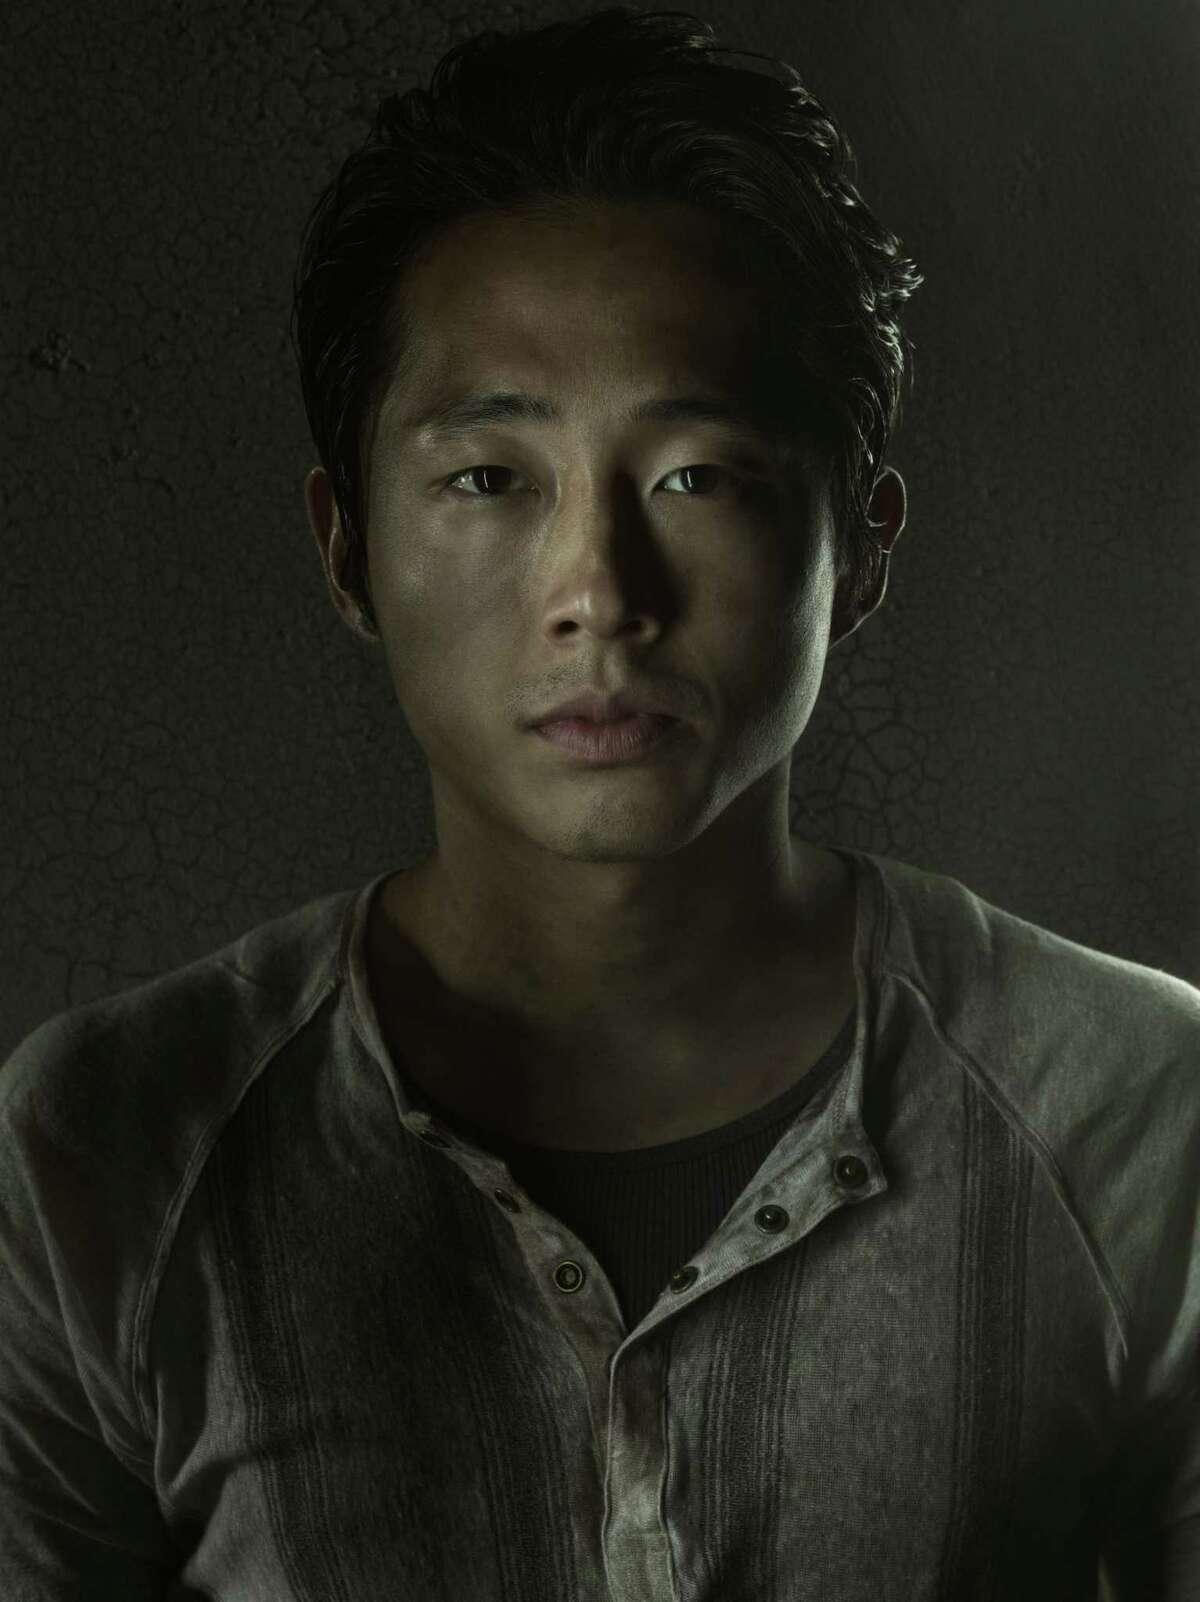 Steven Yeun, who plays Glenn in